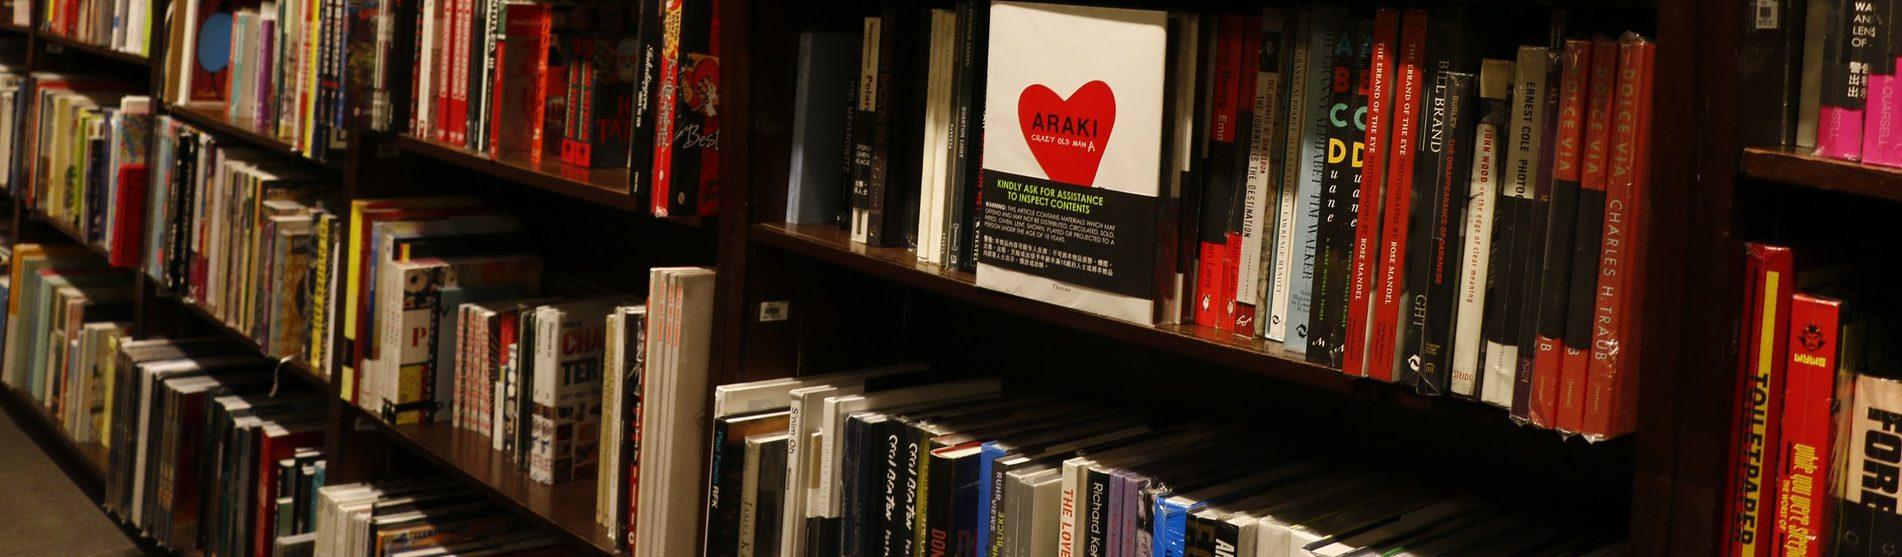 cropped-bookstore-1315560_1920-1.jpg